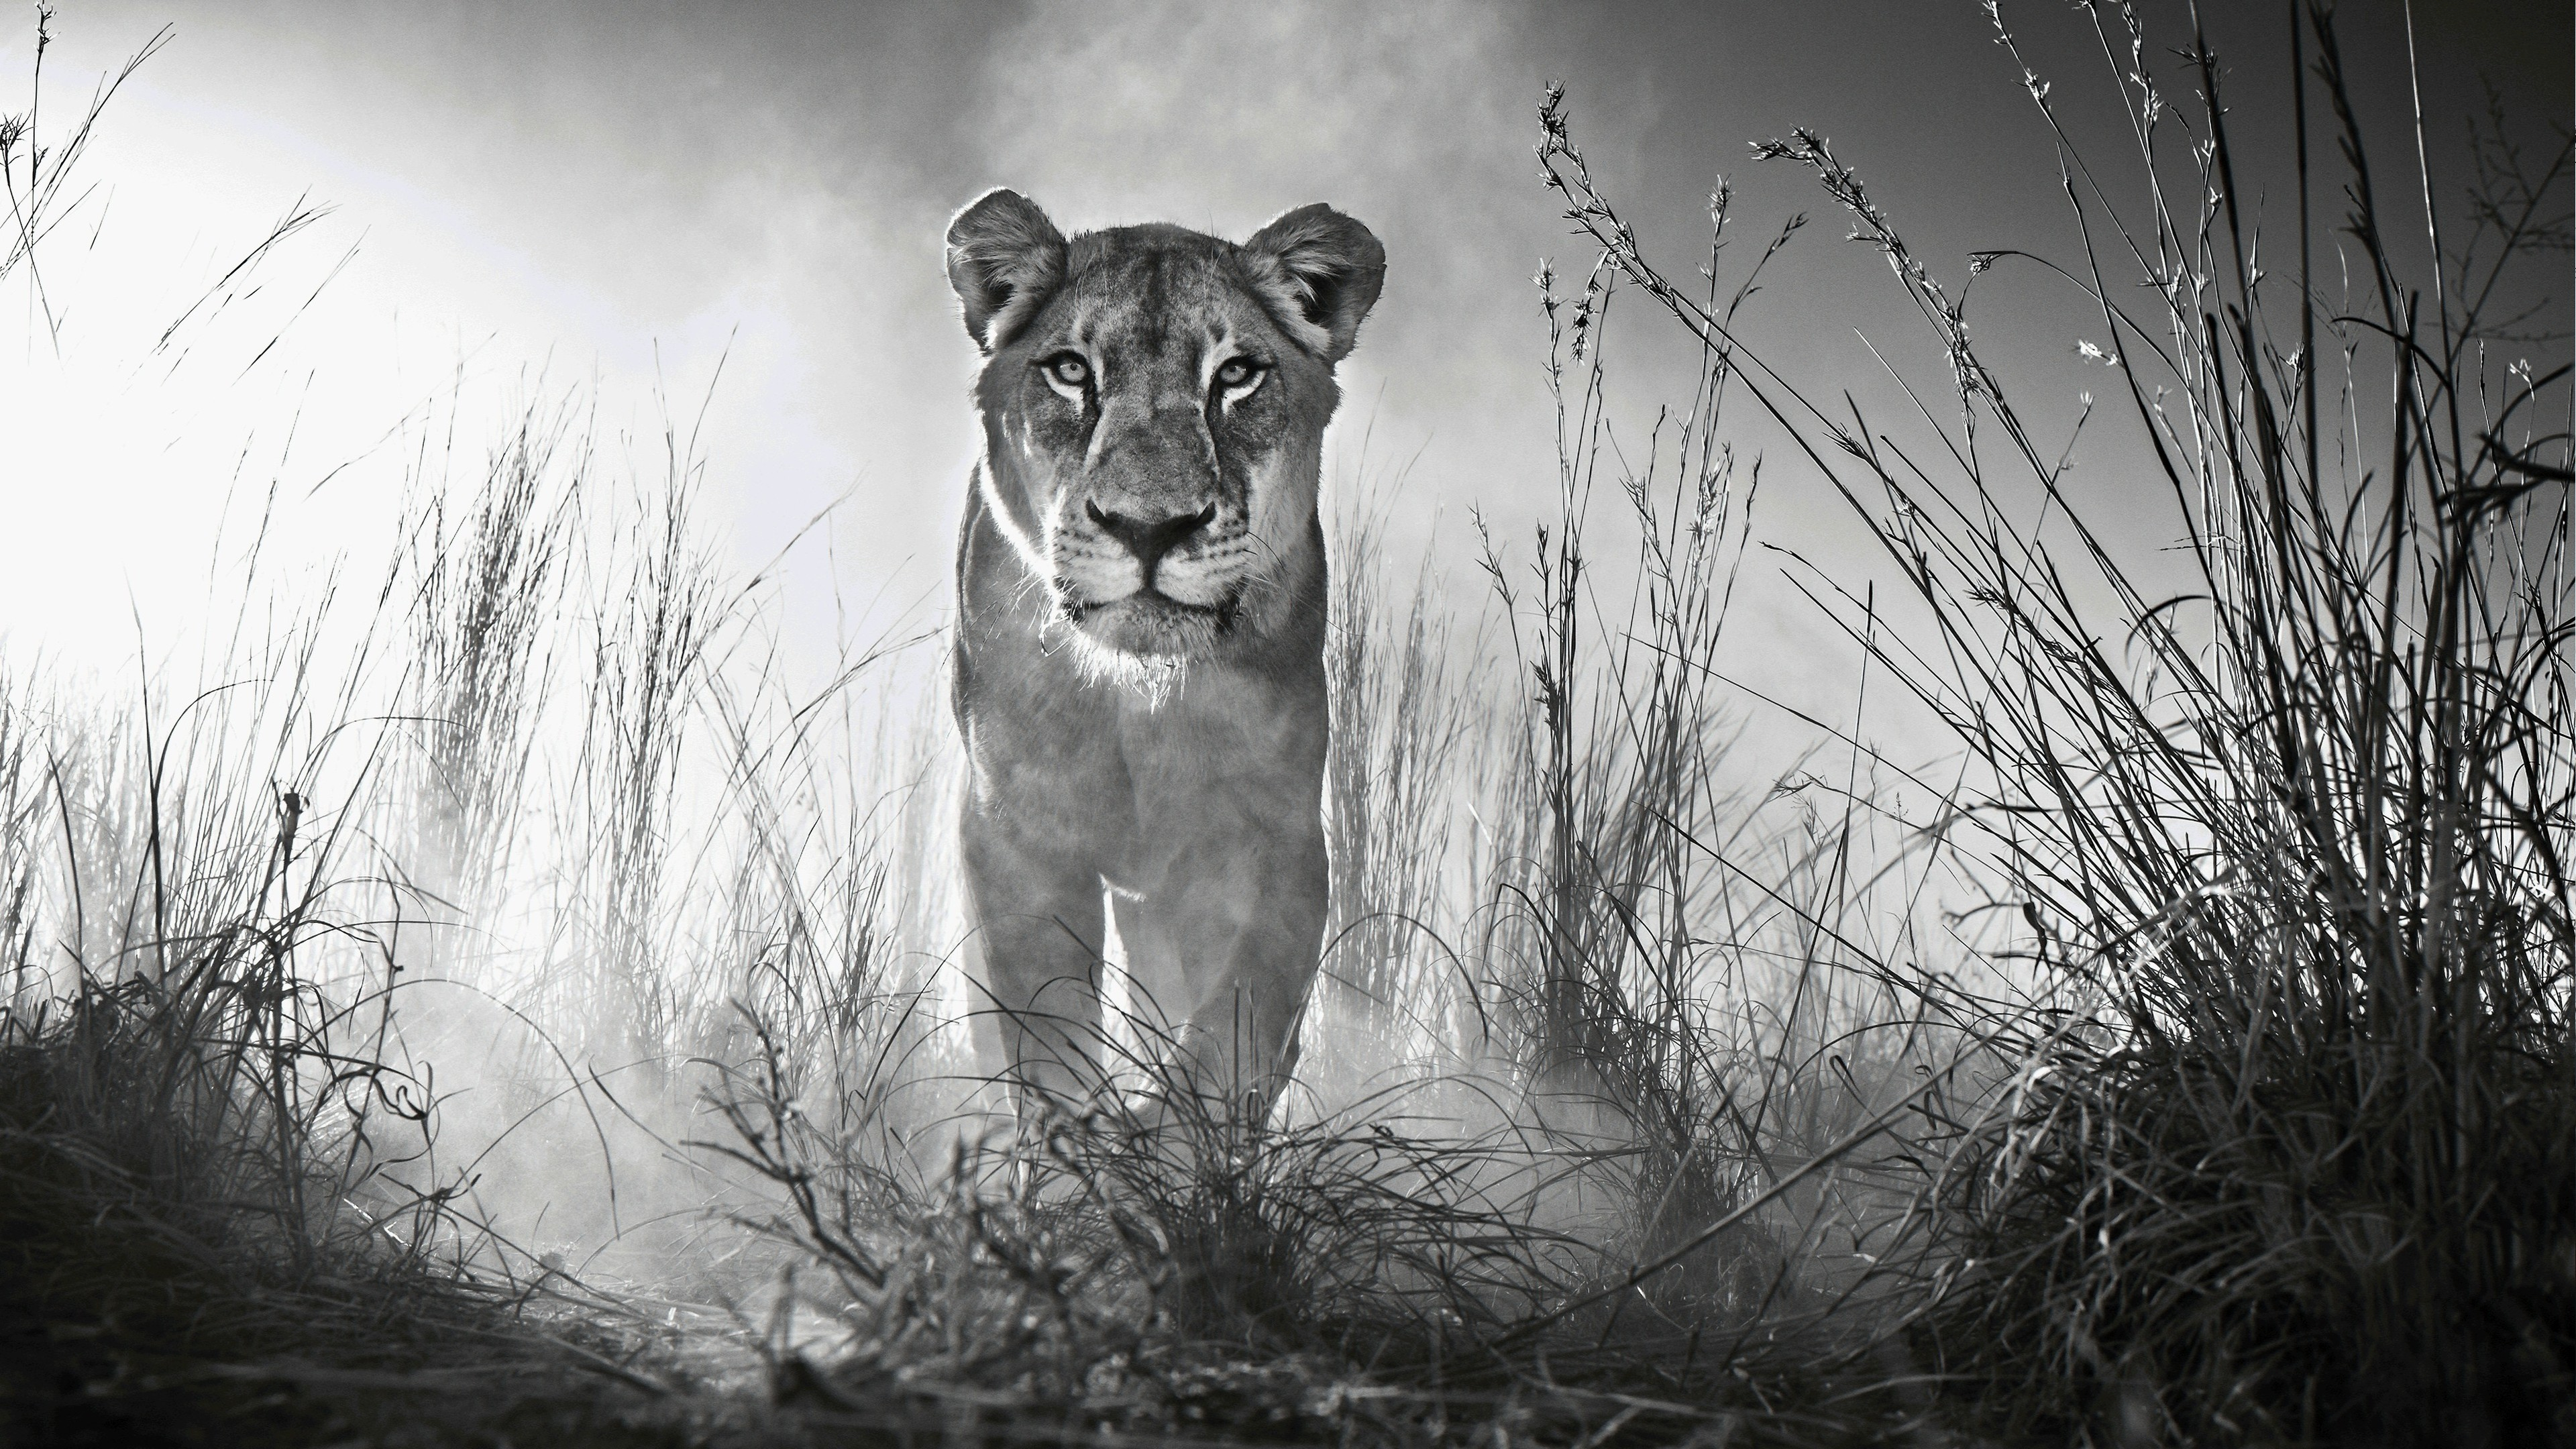 Wallpaper 4k Lion 4k Black And White 4k wallpapers animals 3840x2160